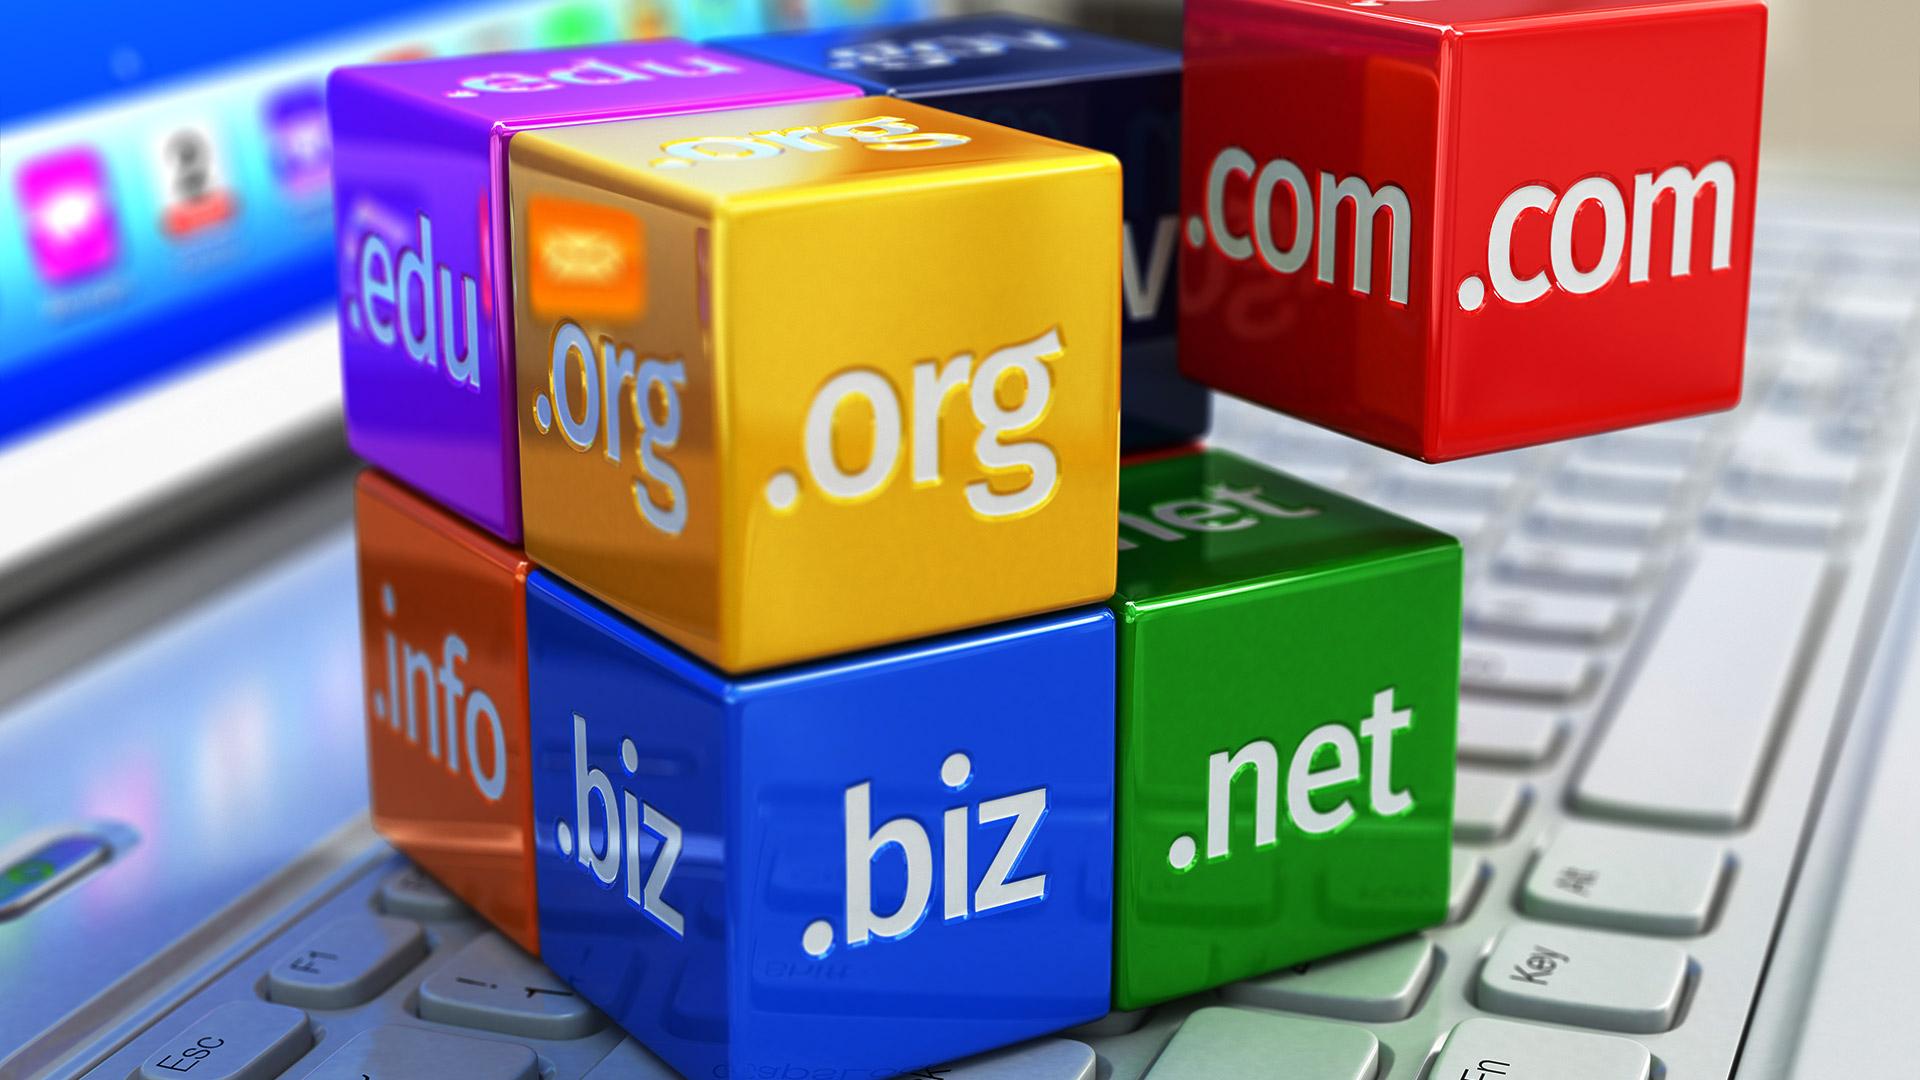 1blu - Webhosting inkl. 2 Domains (.com, .eu, .de, .net usw) 1 EUR mtl. 60GB